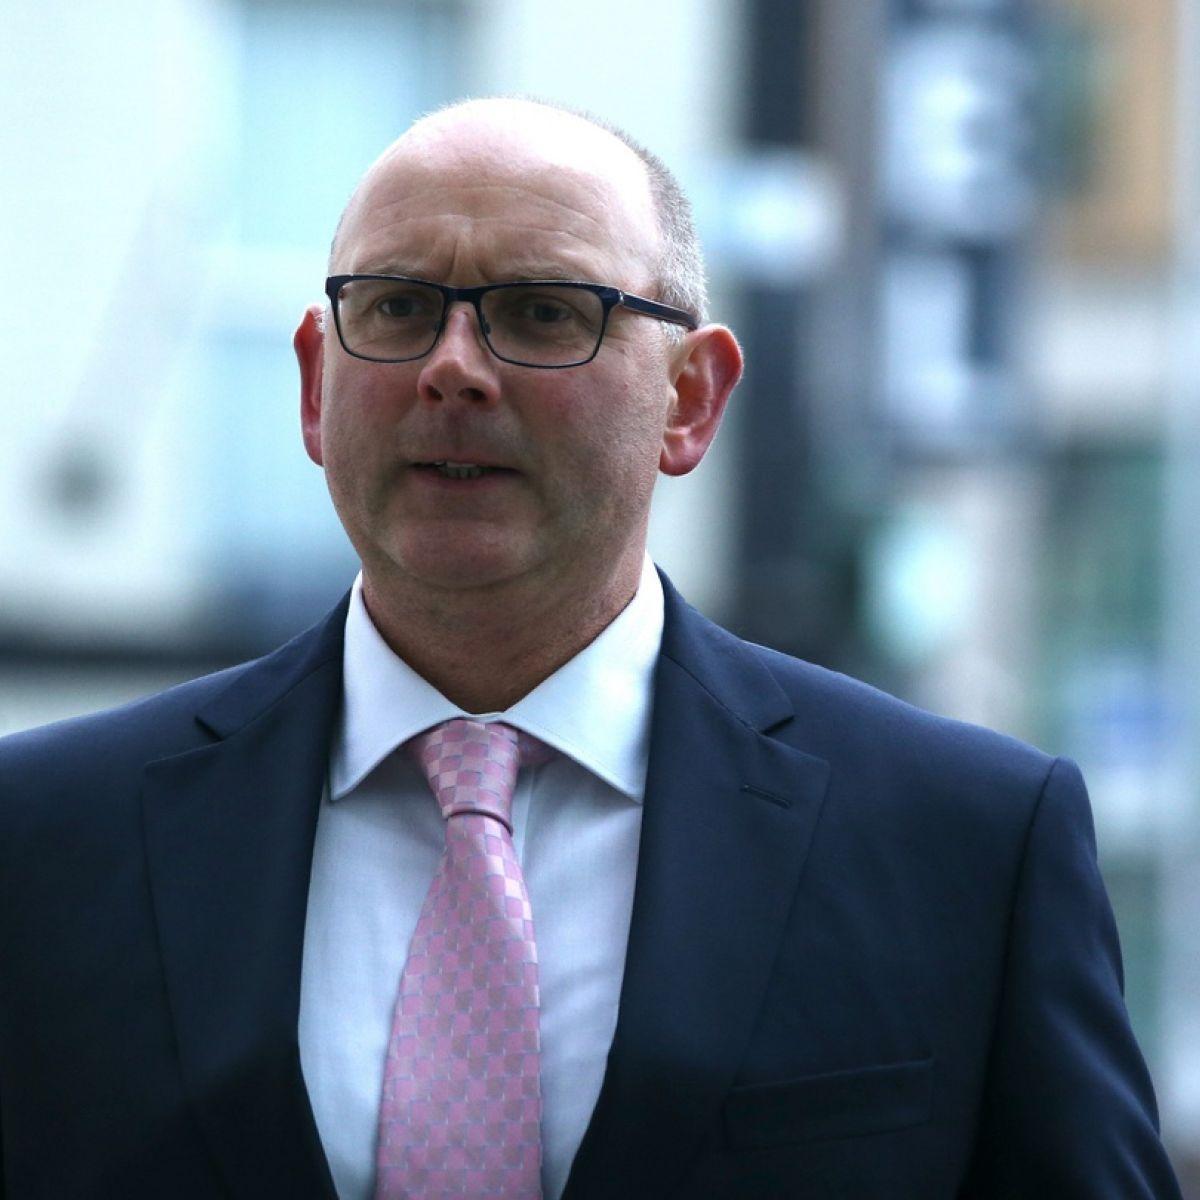 Garda Came Forward To Strike Rte Cameraman Reporter Says